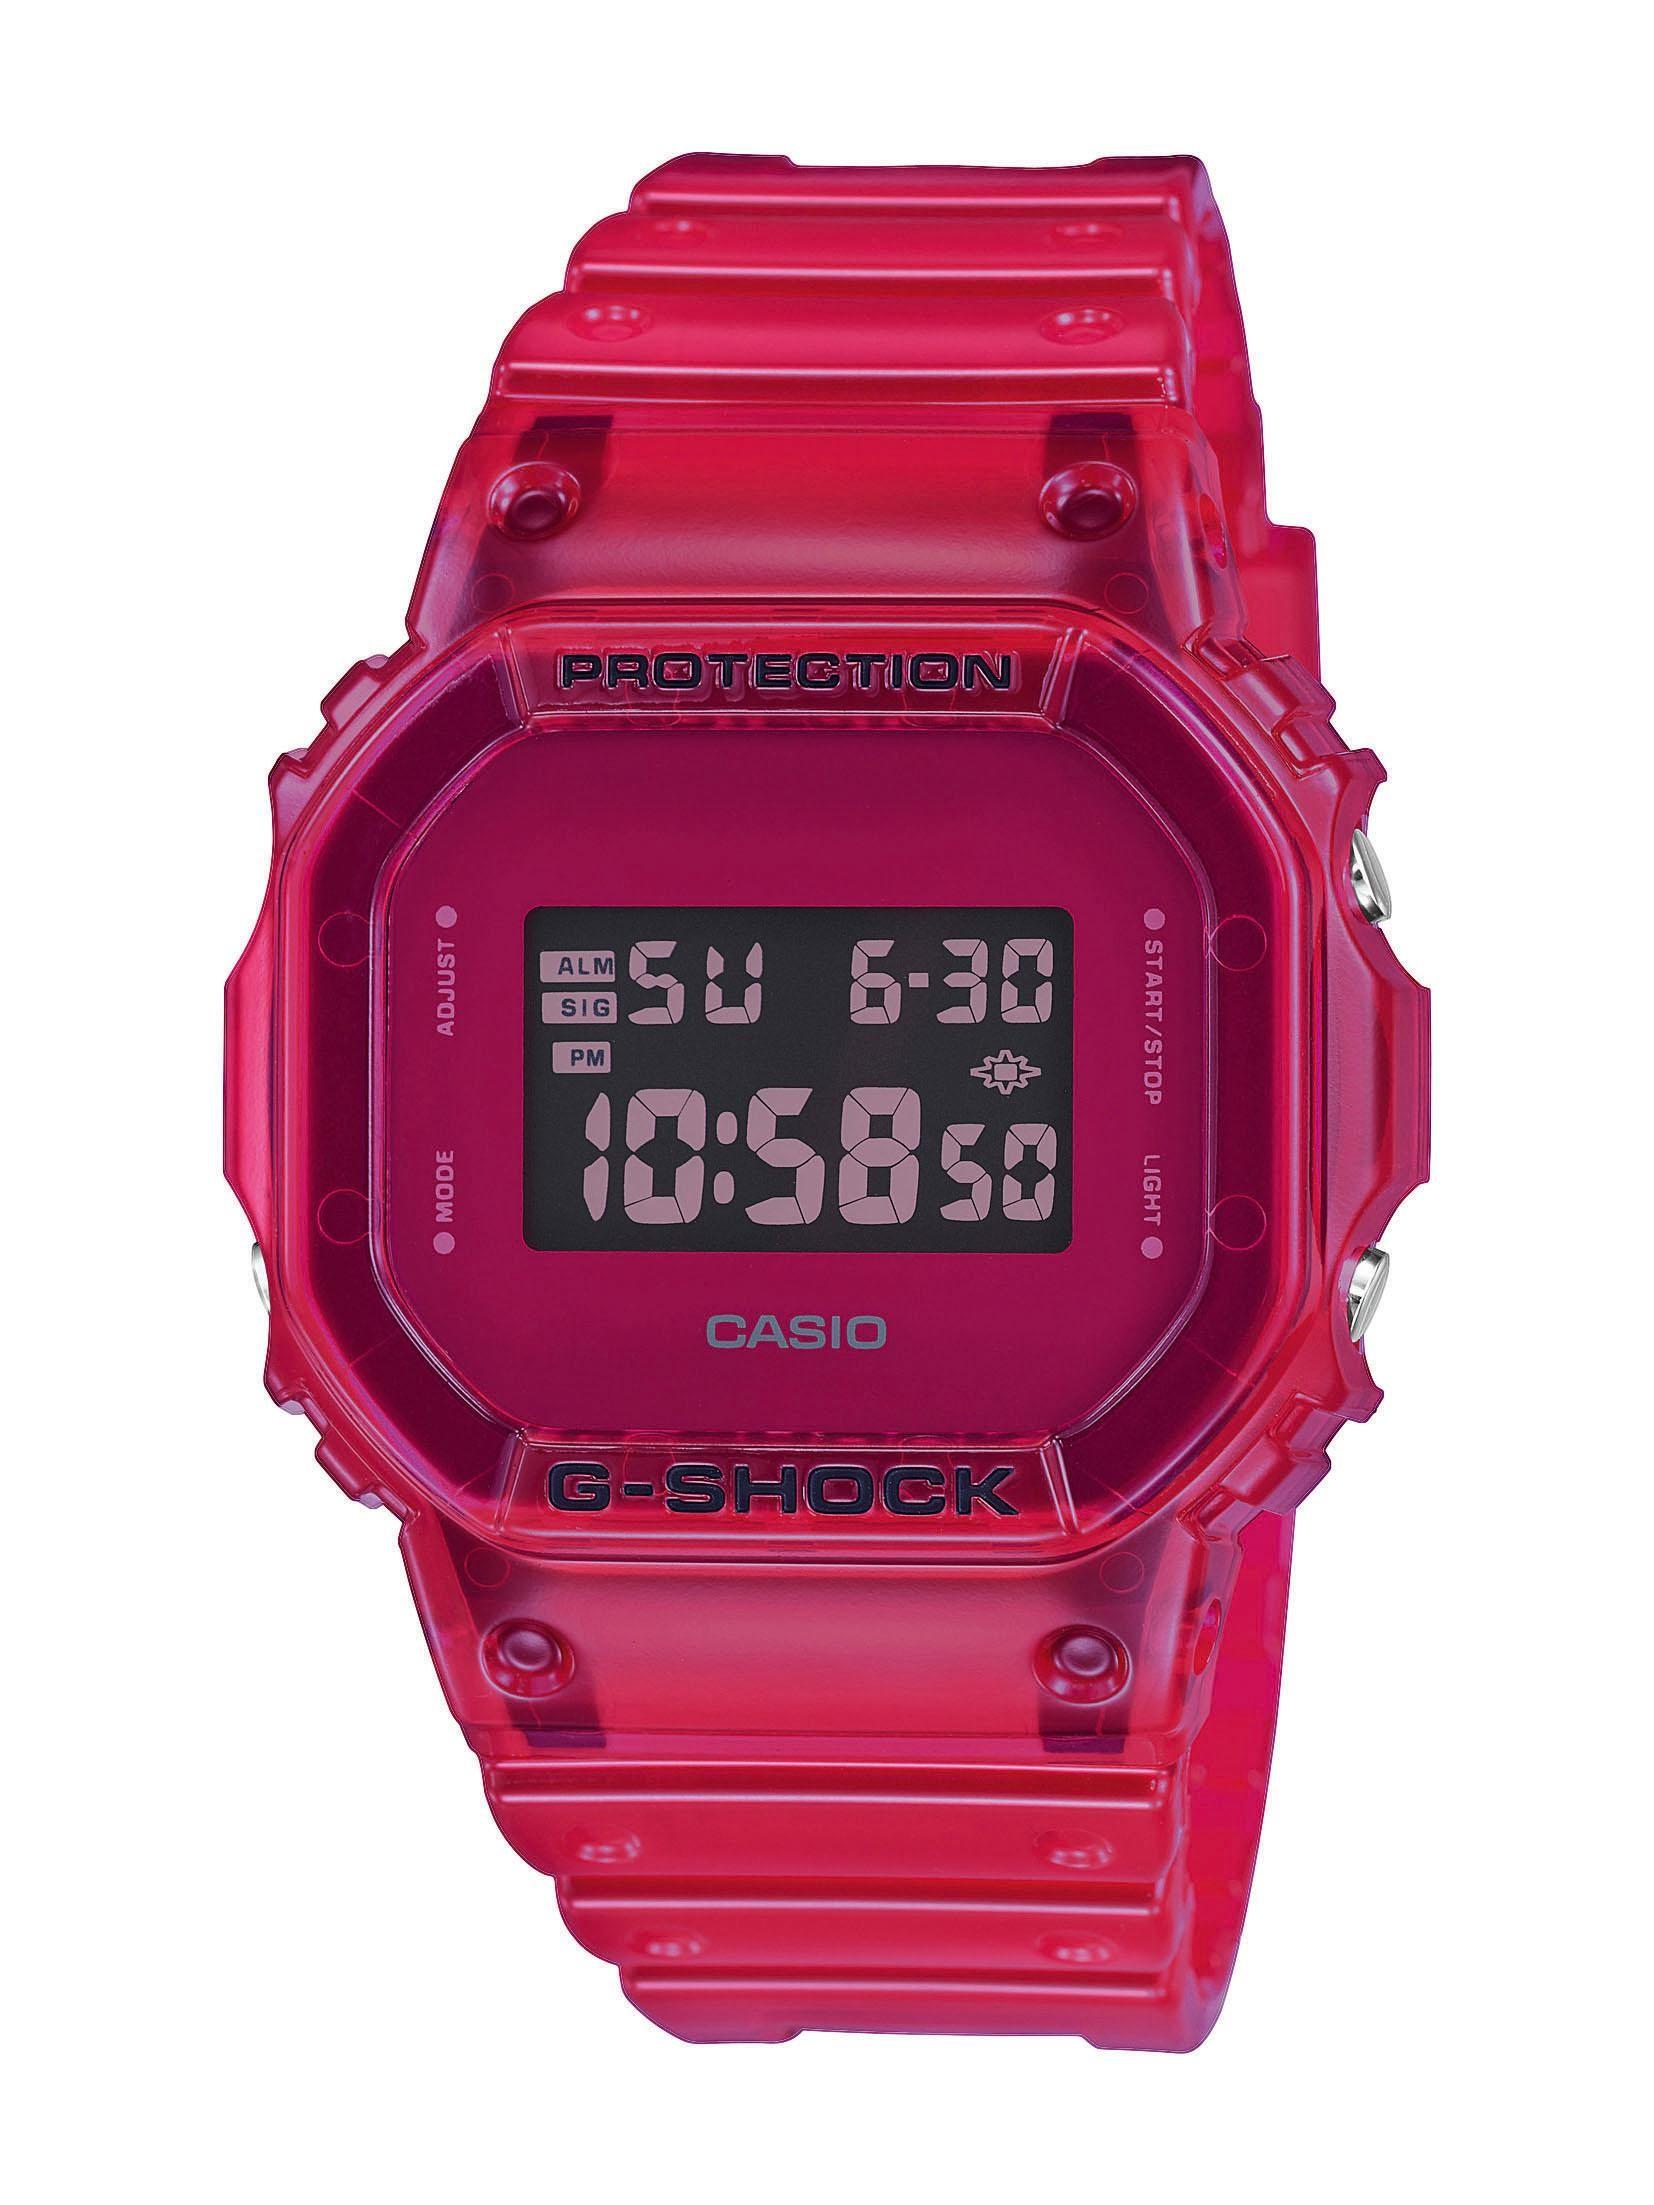 G-Shock Origin Red